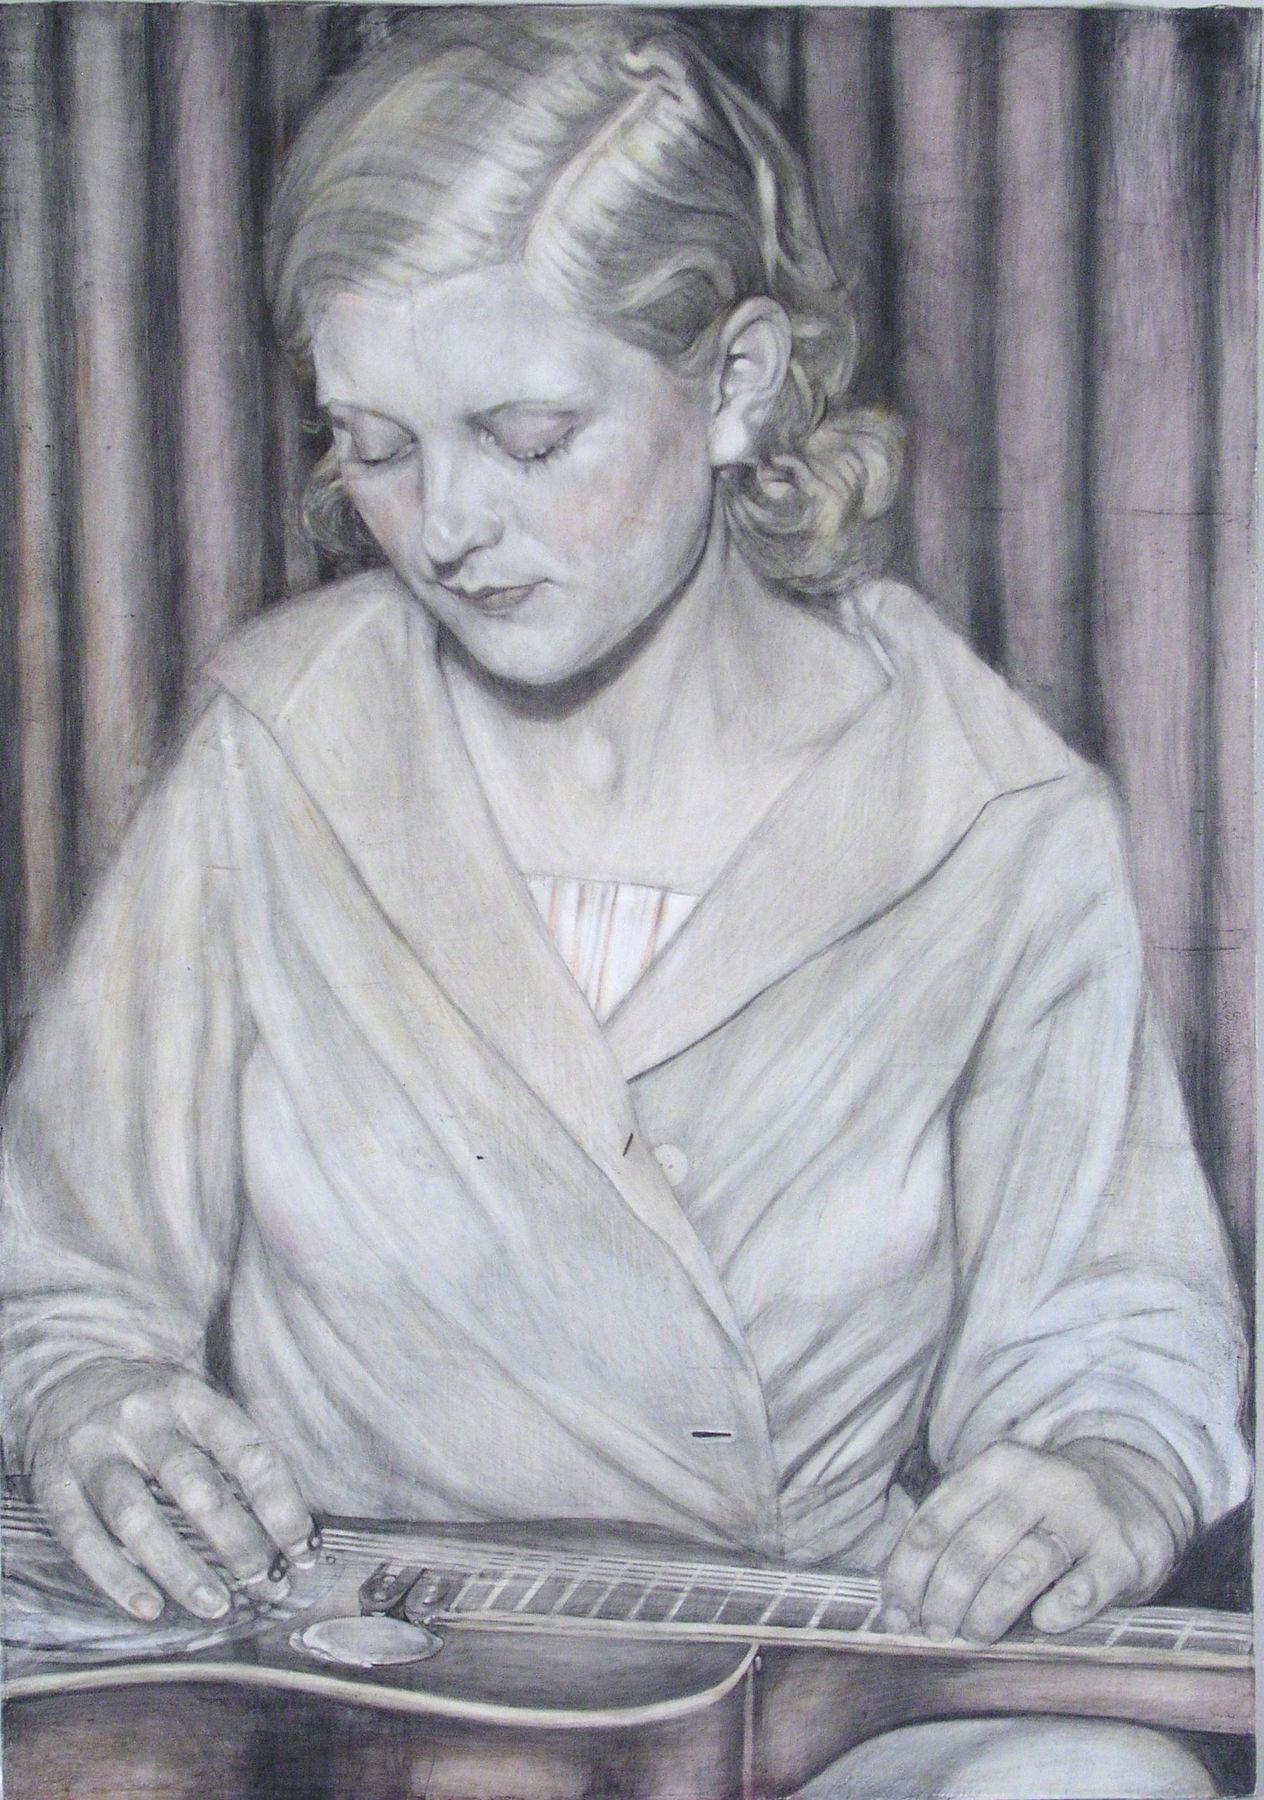 Jenny Scobel, Blond in Red White Blue, 2009